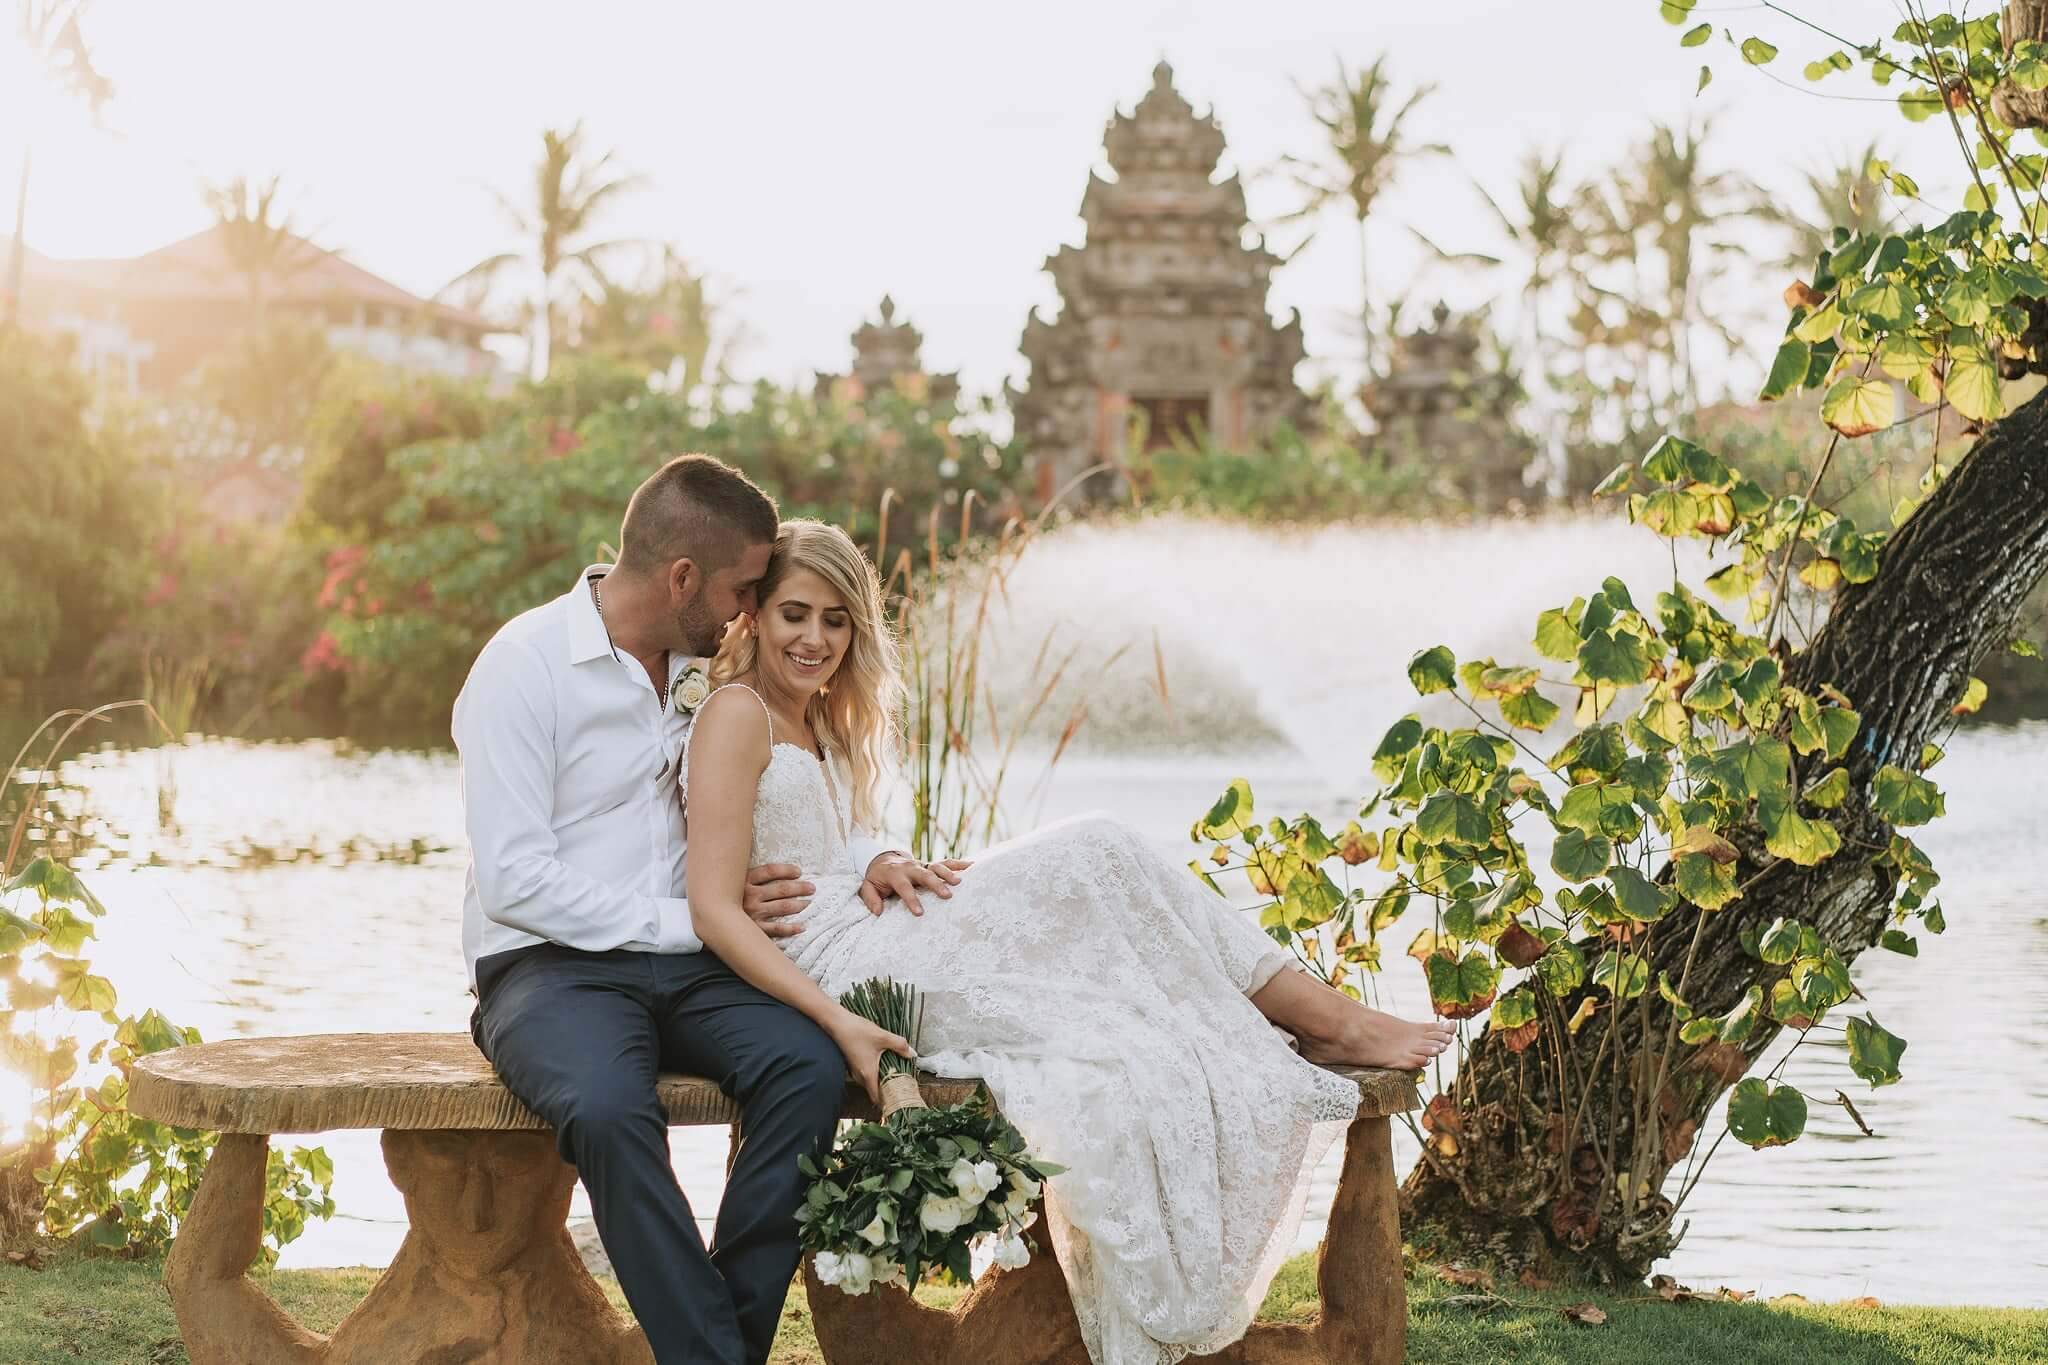 rambo-estrada-jamiejayson-ayodya-resort-nusa-dua-bali-wedding-photographer-2477-min (1).JPG